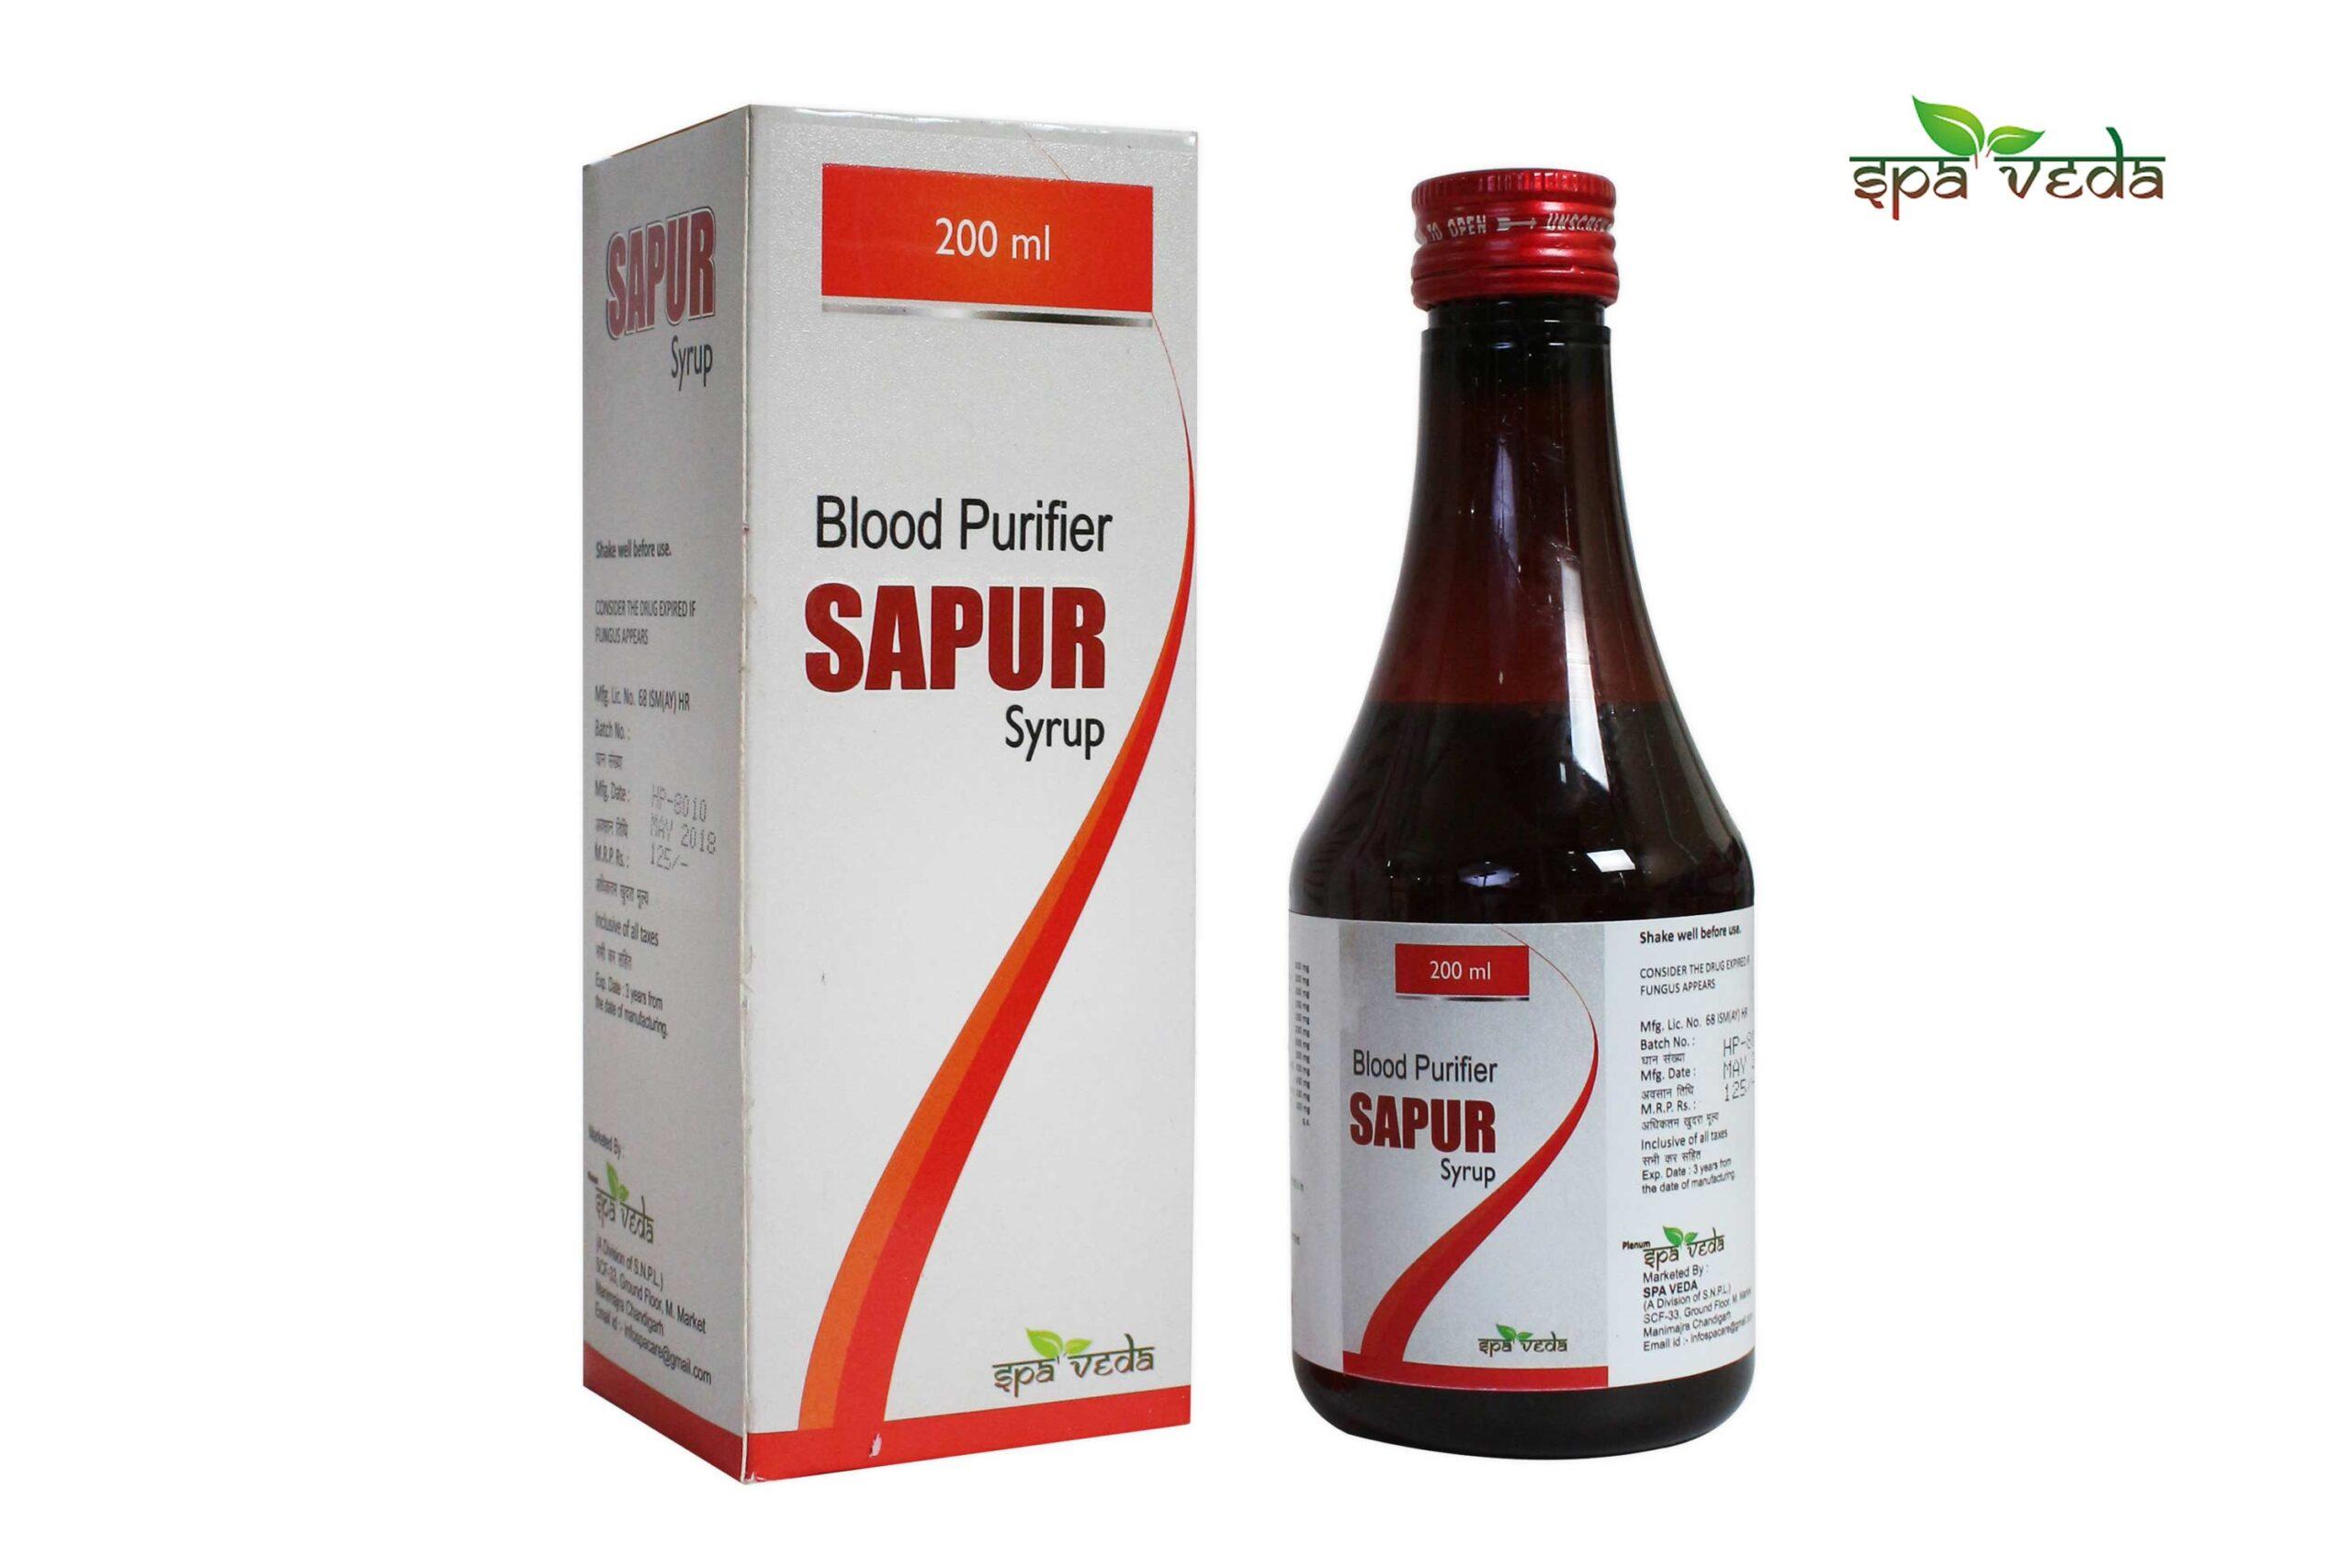 Sapur-Syrup